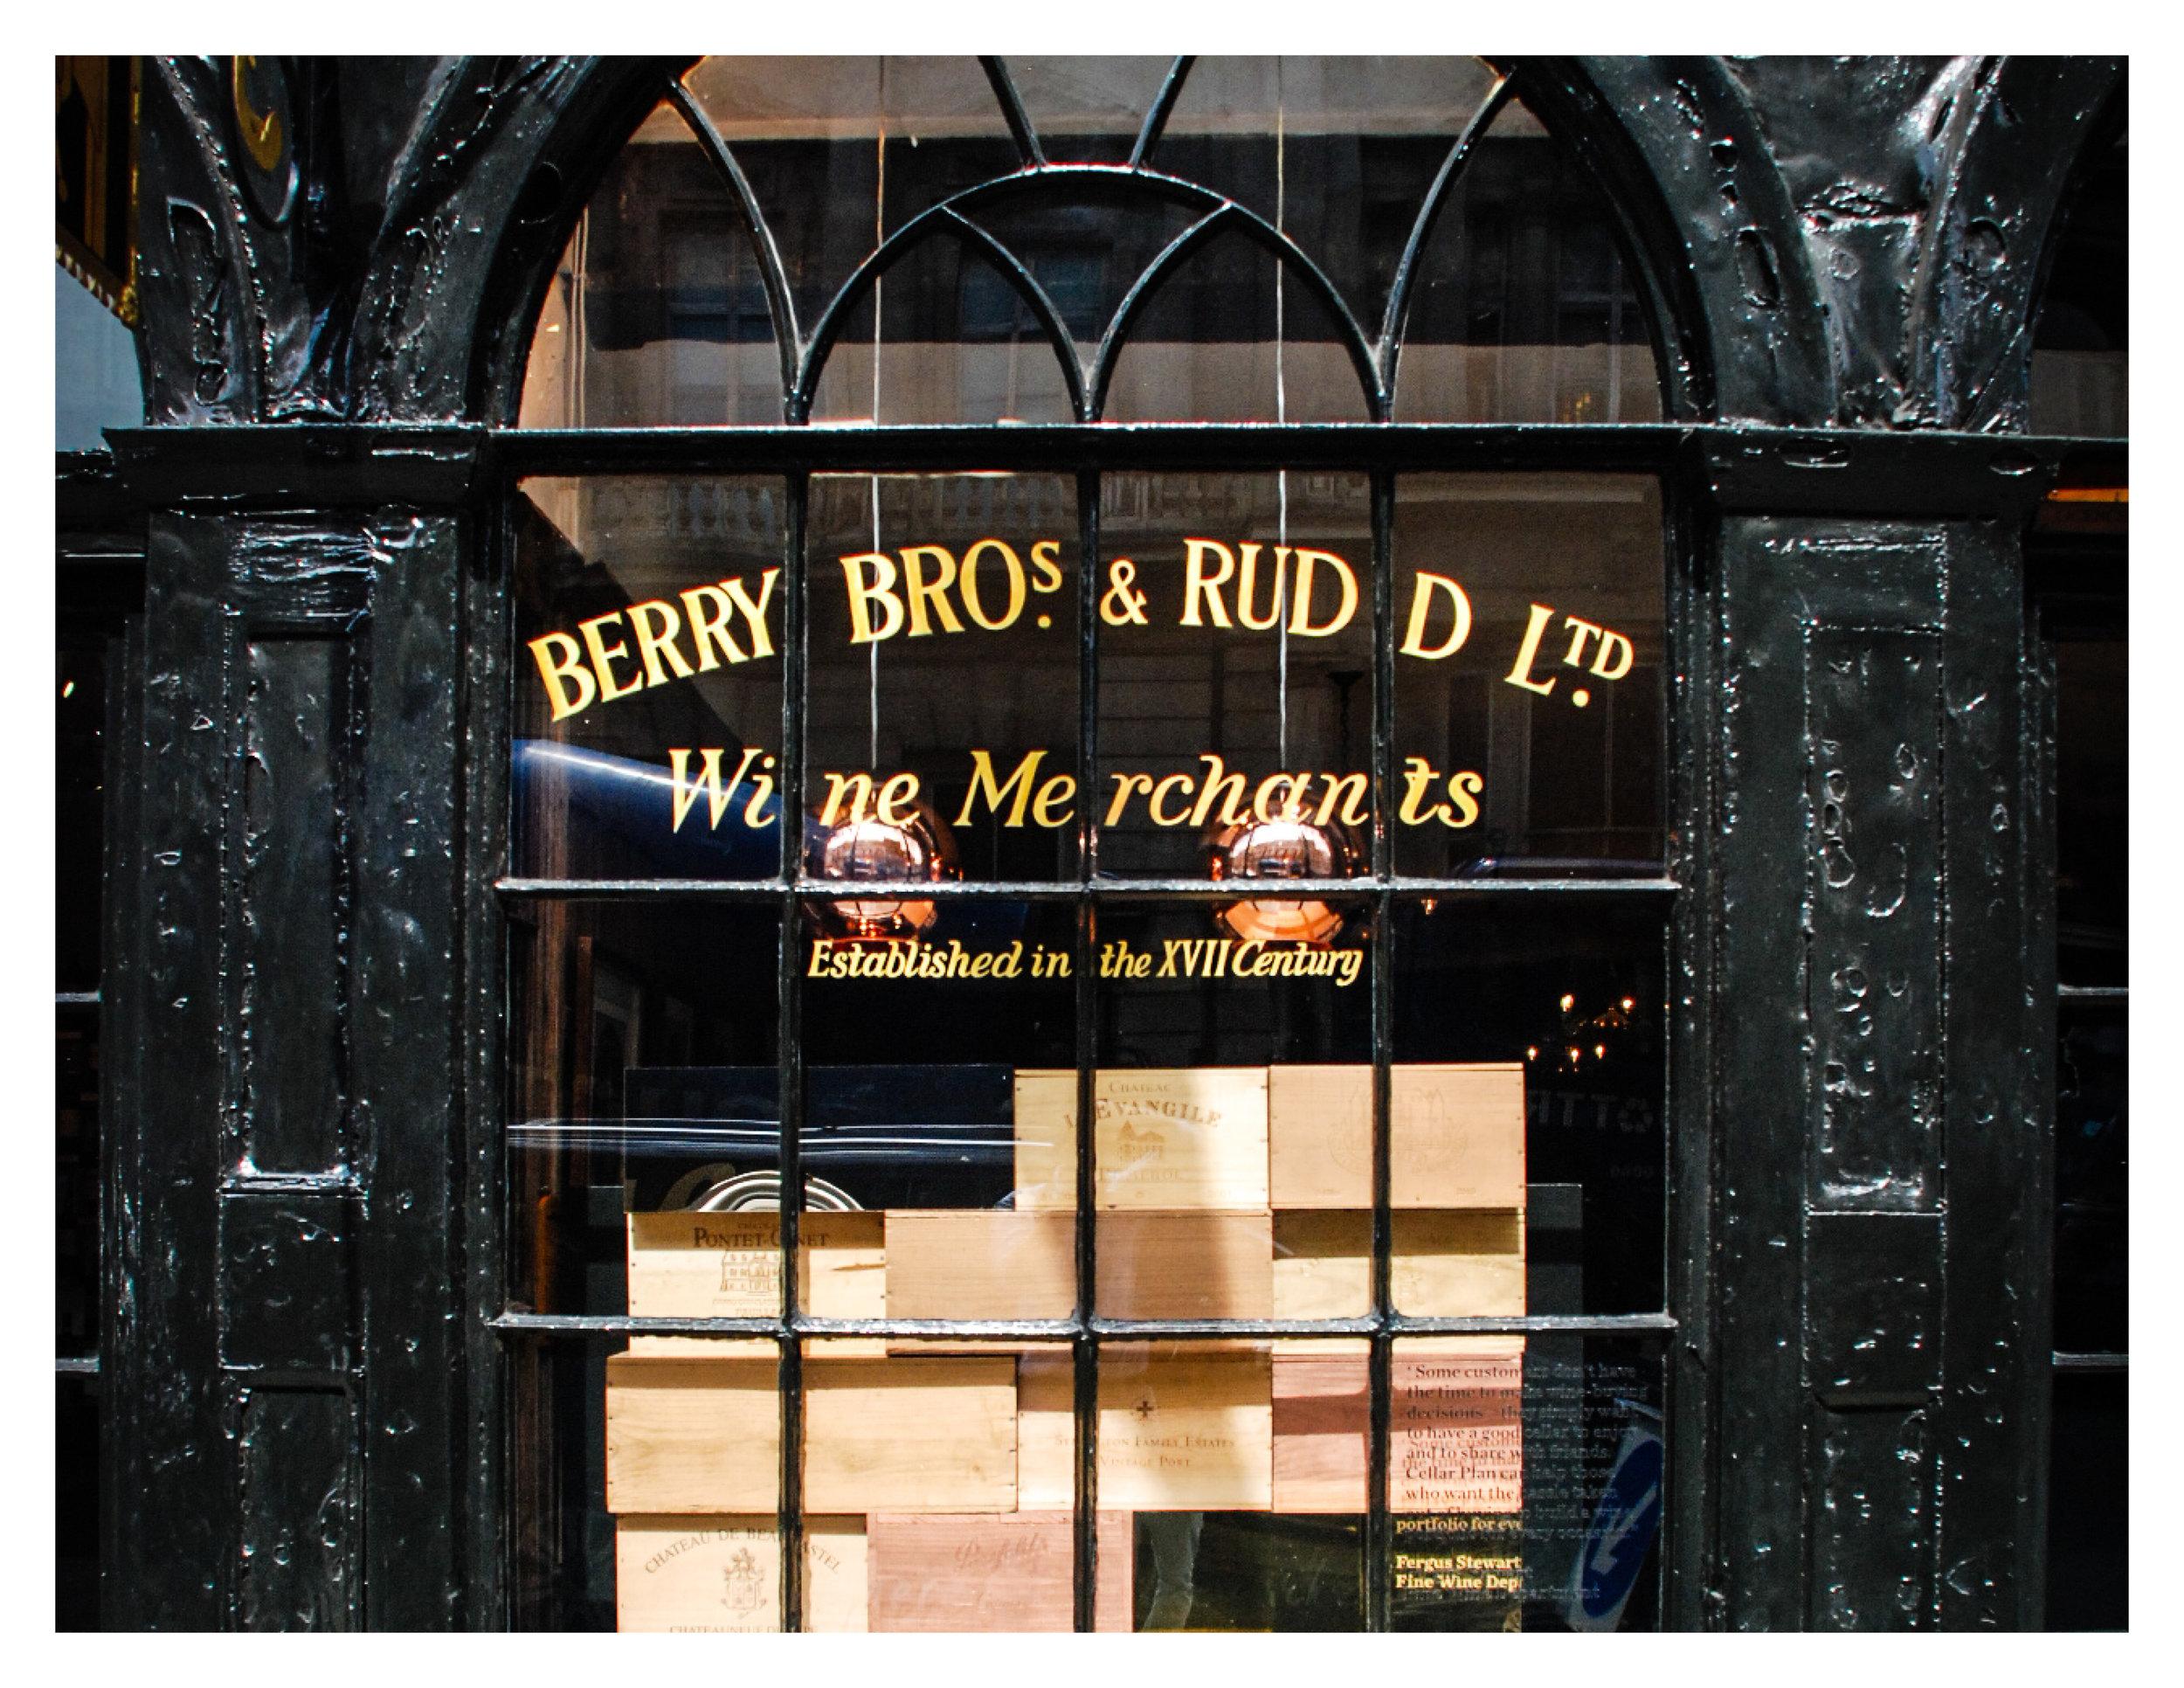 Berry Bros.jpg